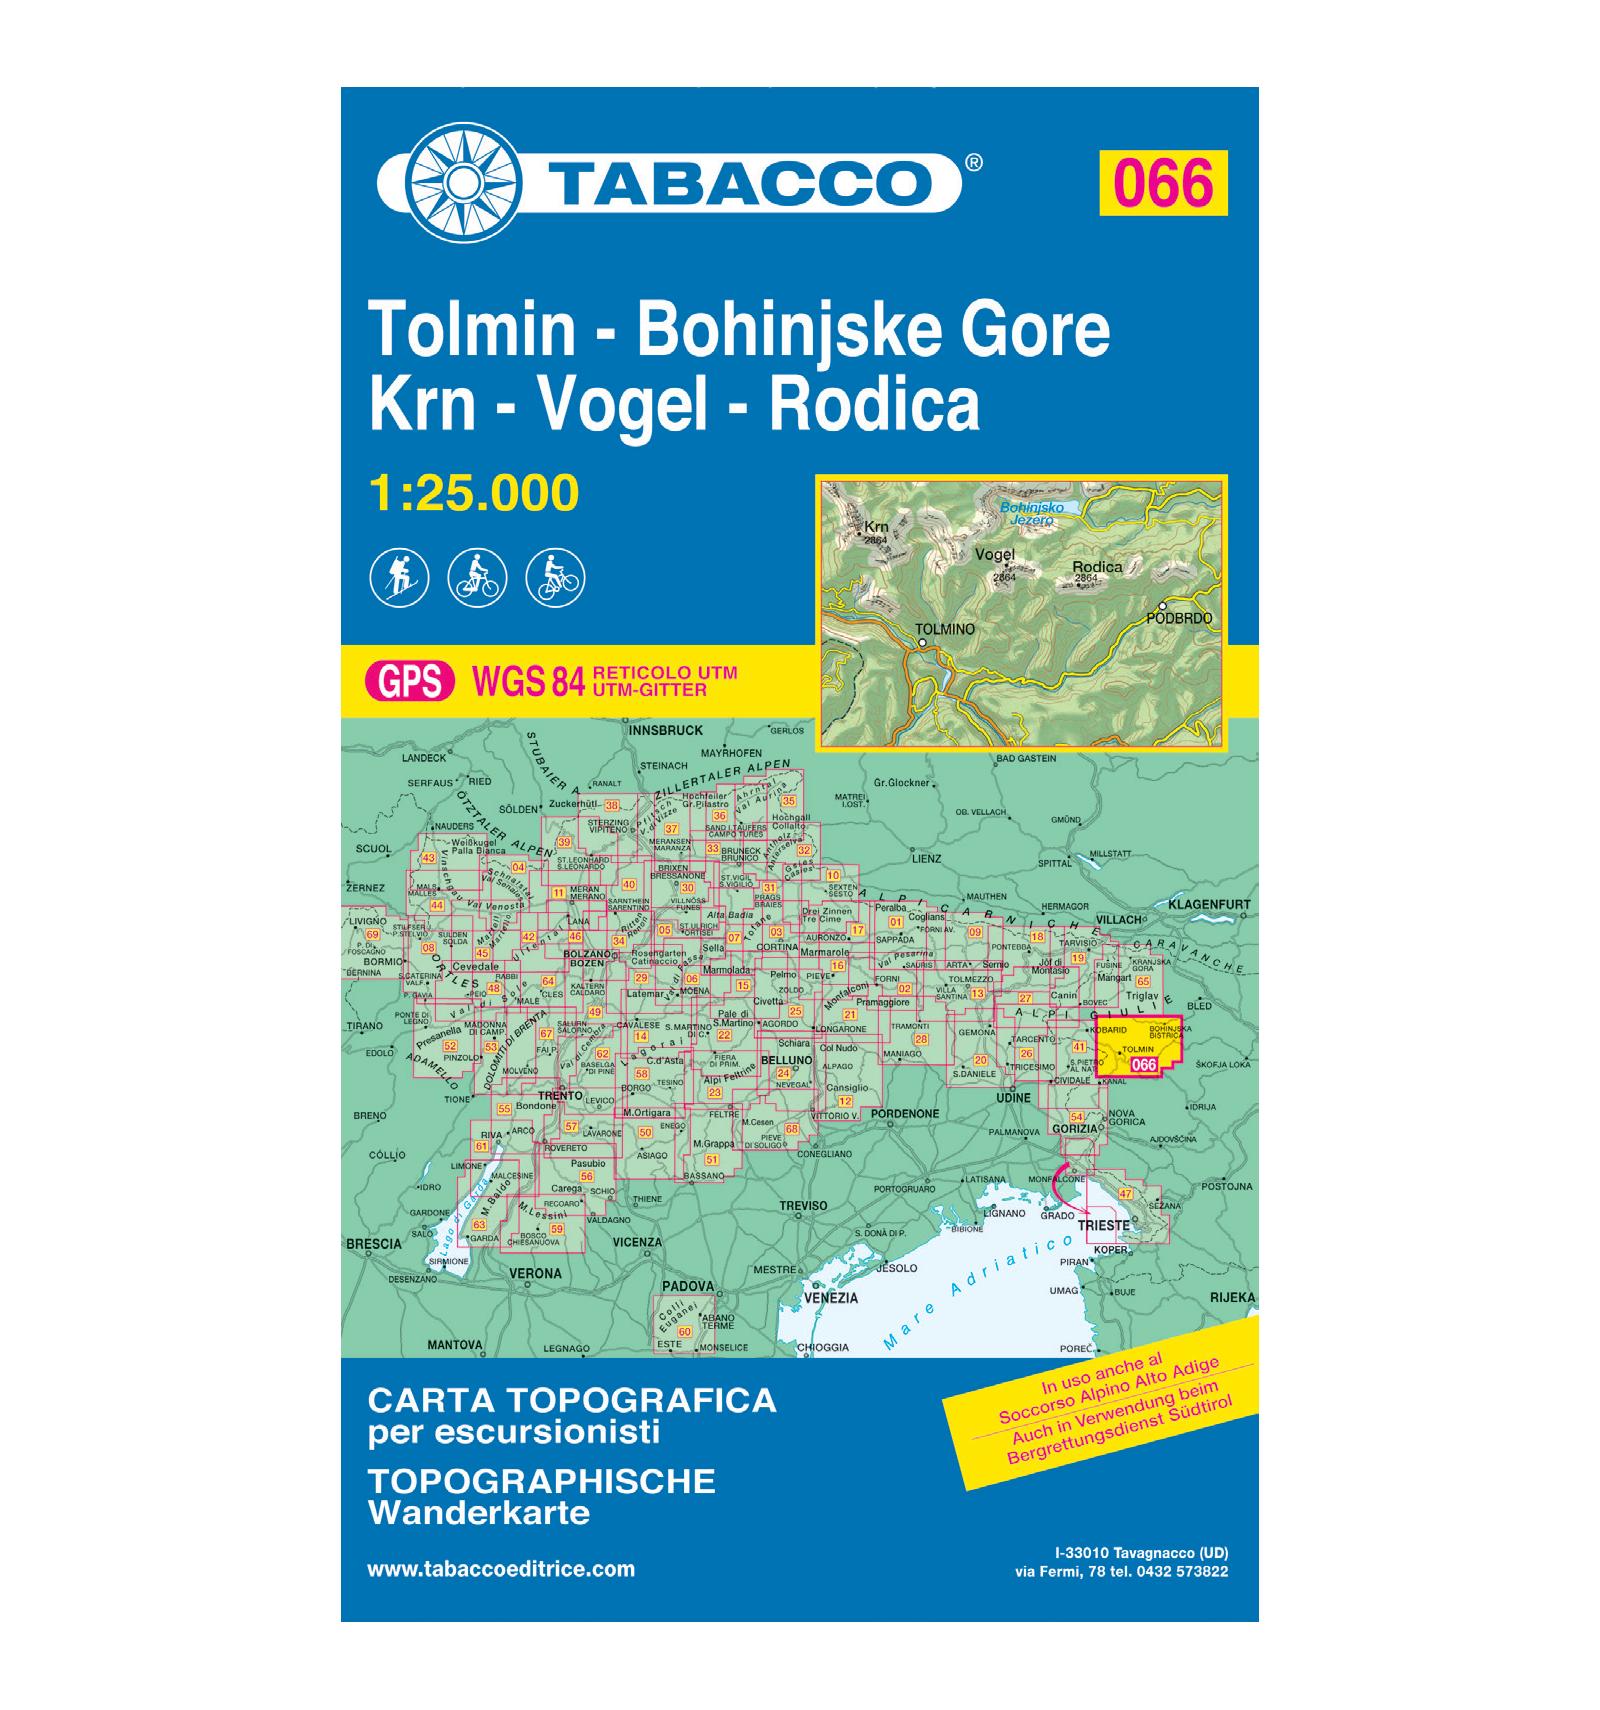 Cartina Tabacco 019.Carta Topografica Tabacco N 066 Tolmin Bohinjske Gore Krn Vogel Rodica 1 25 000